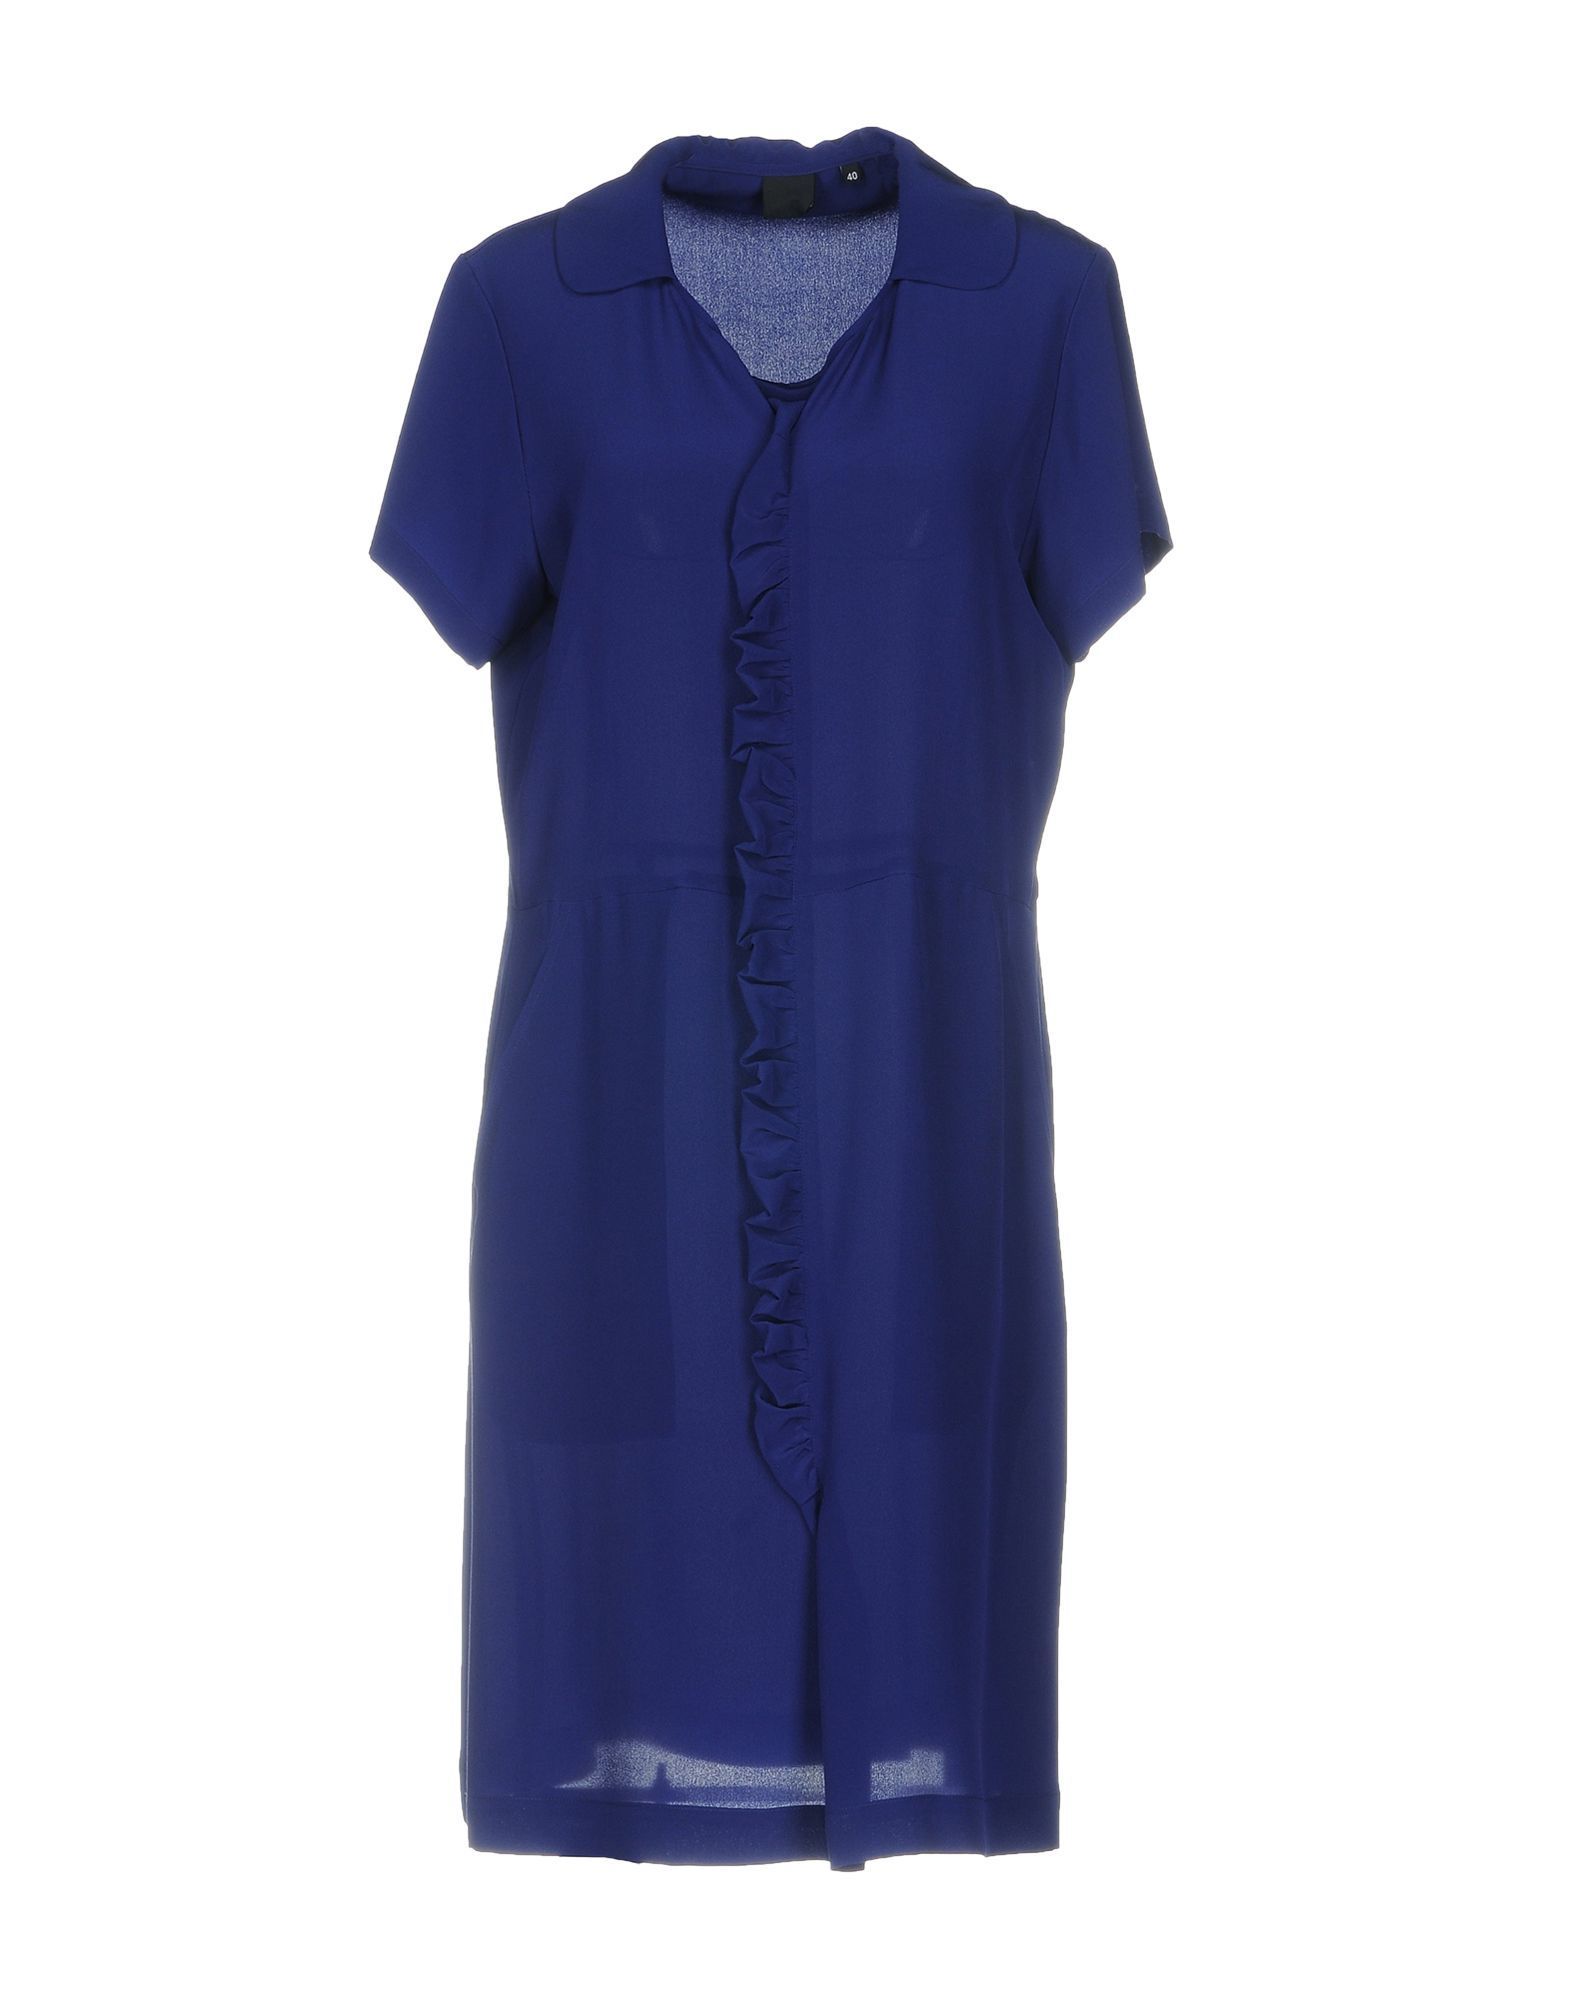 Aspesi Bright Blue Silk Short Sleeve Dress